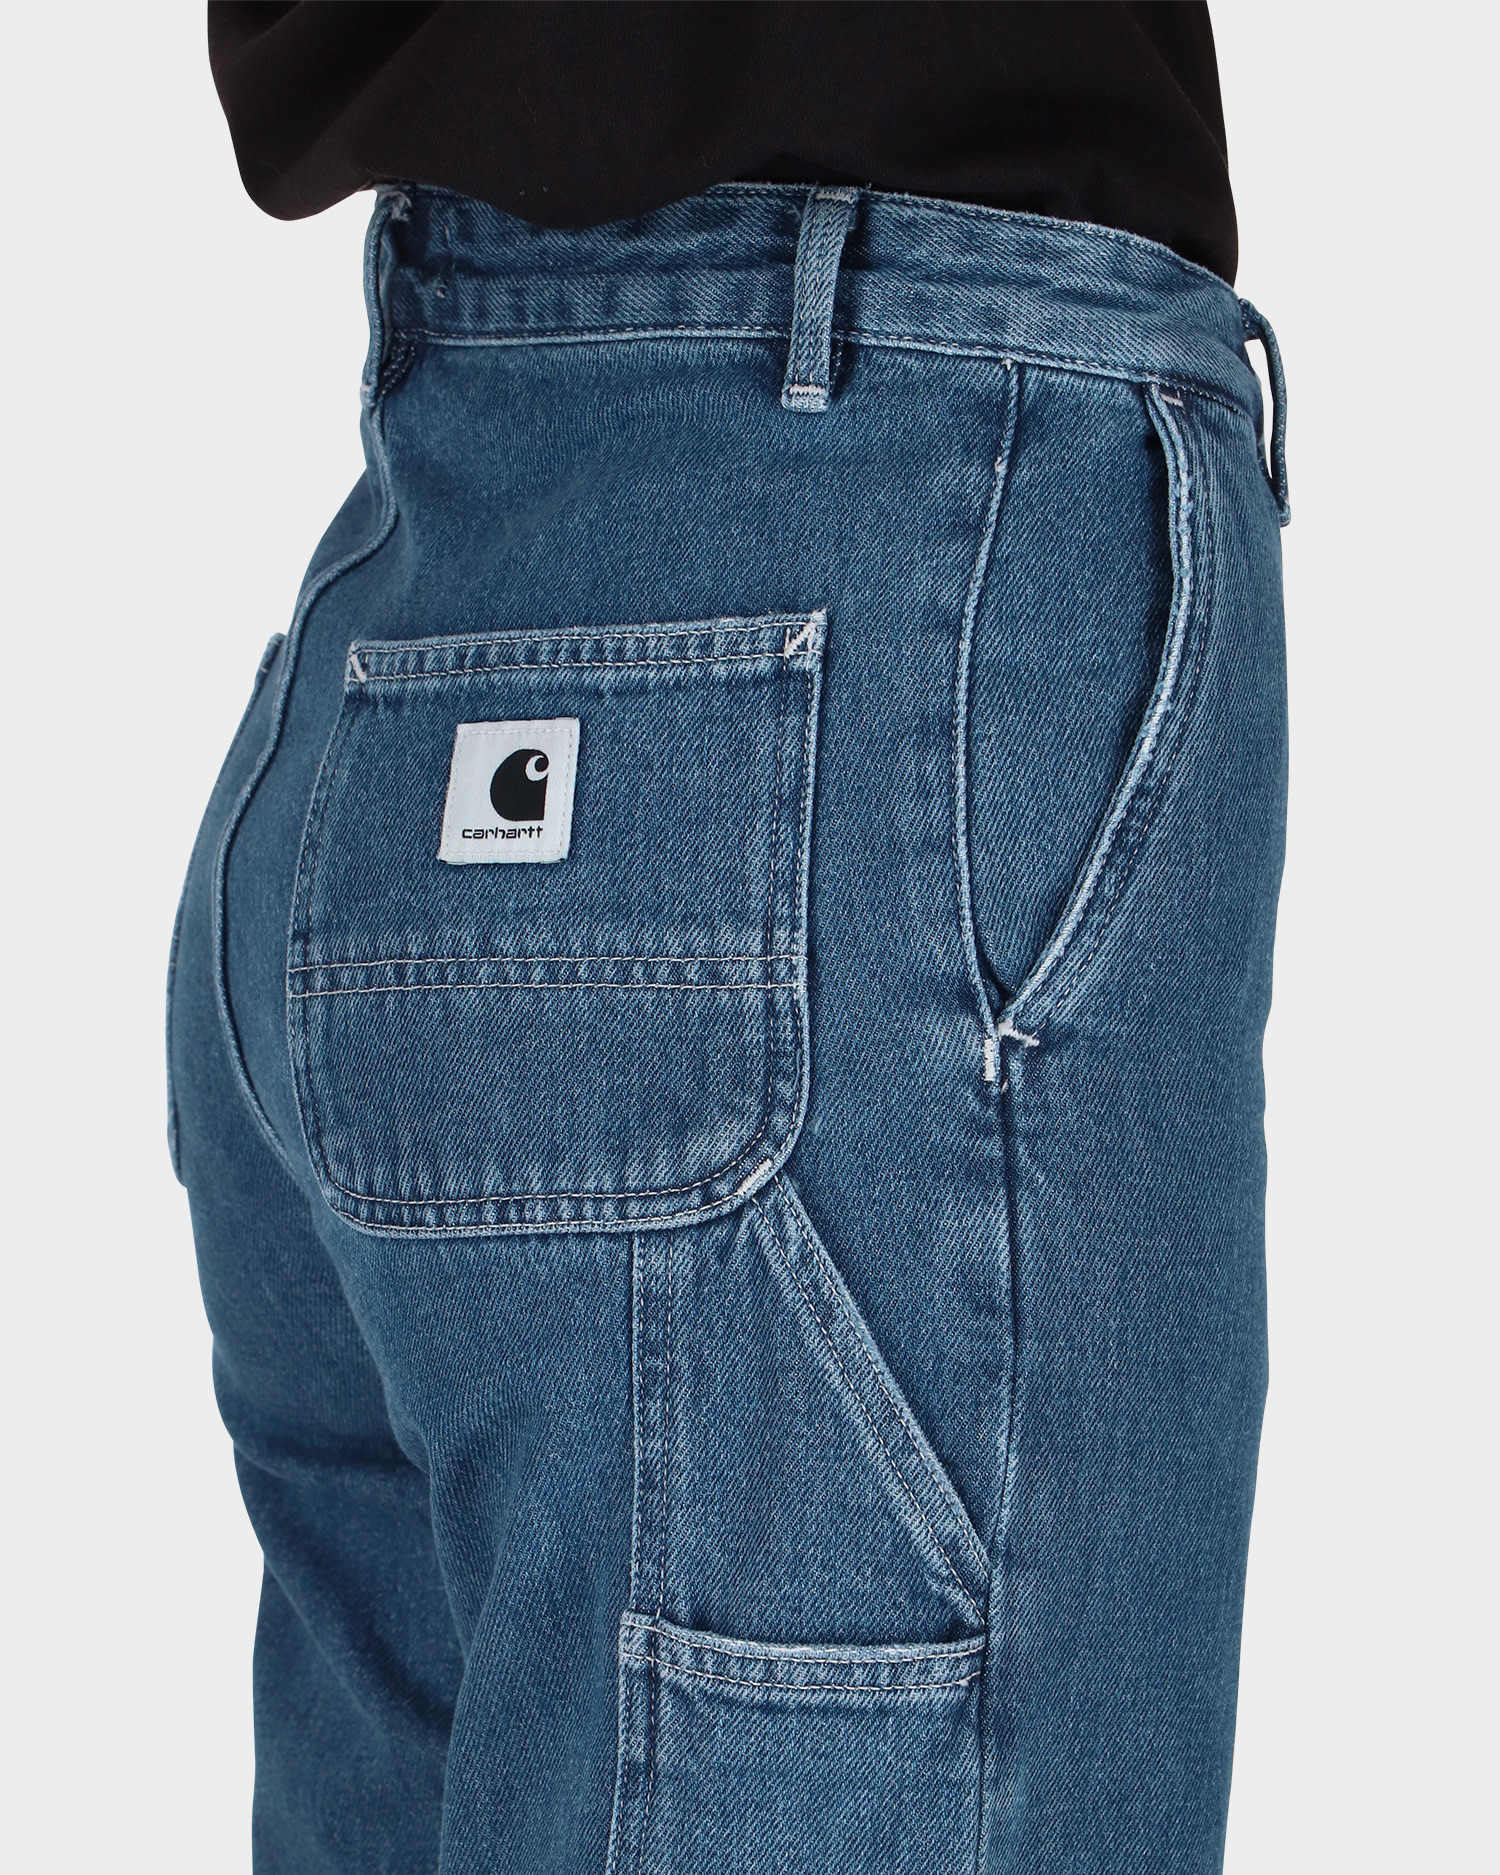 Carhartt W' Pierce Pant Blue Stone Washed